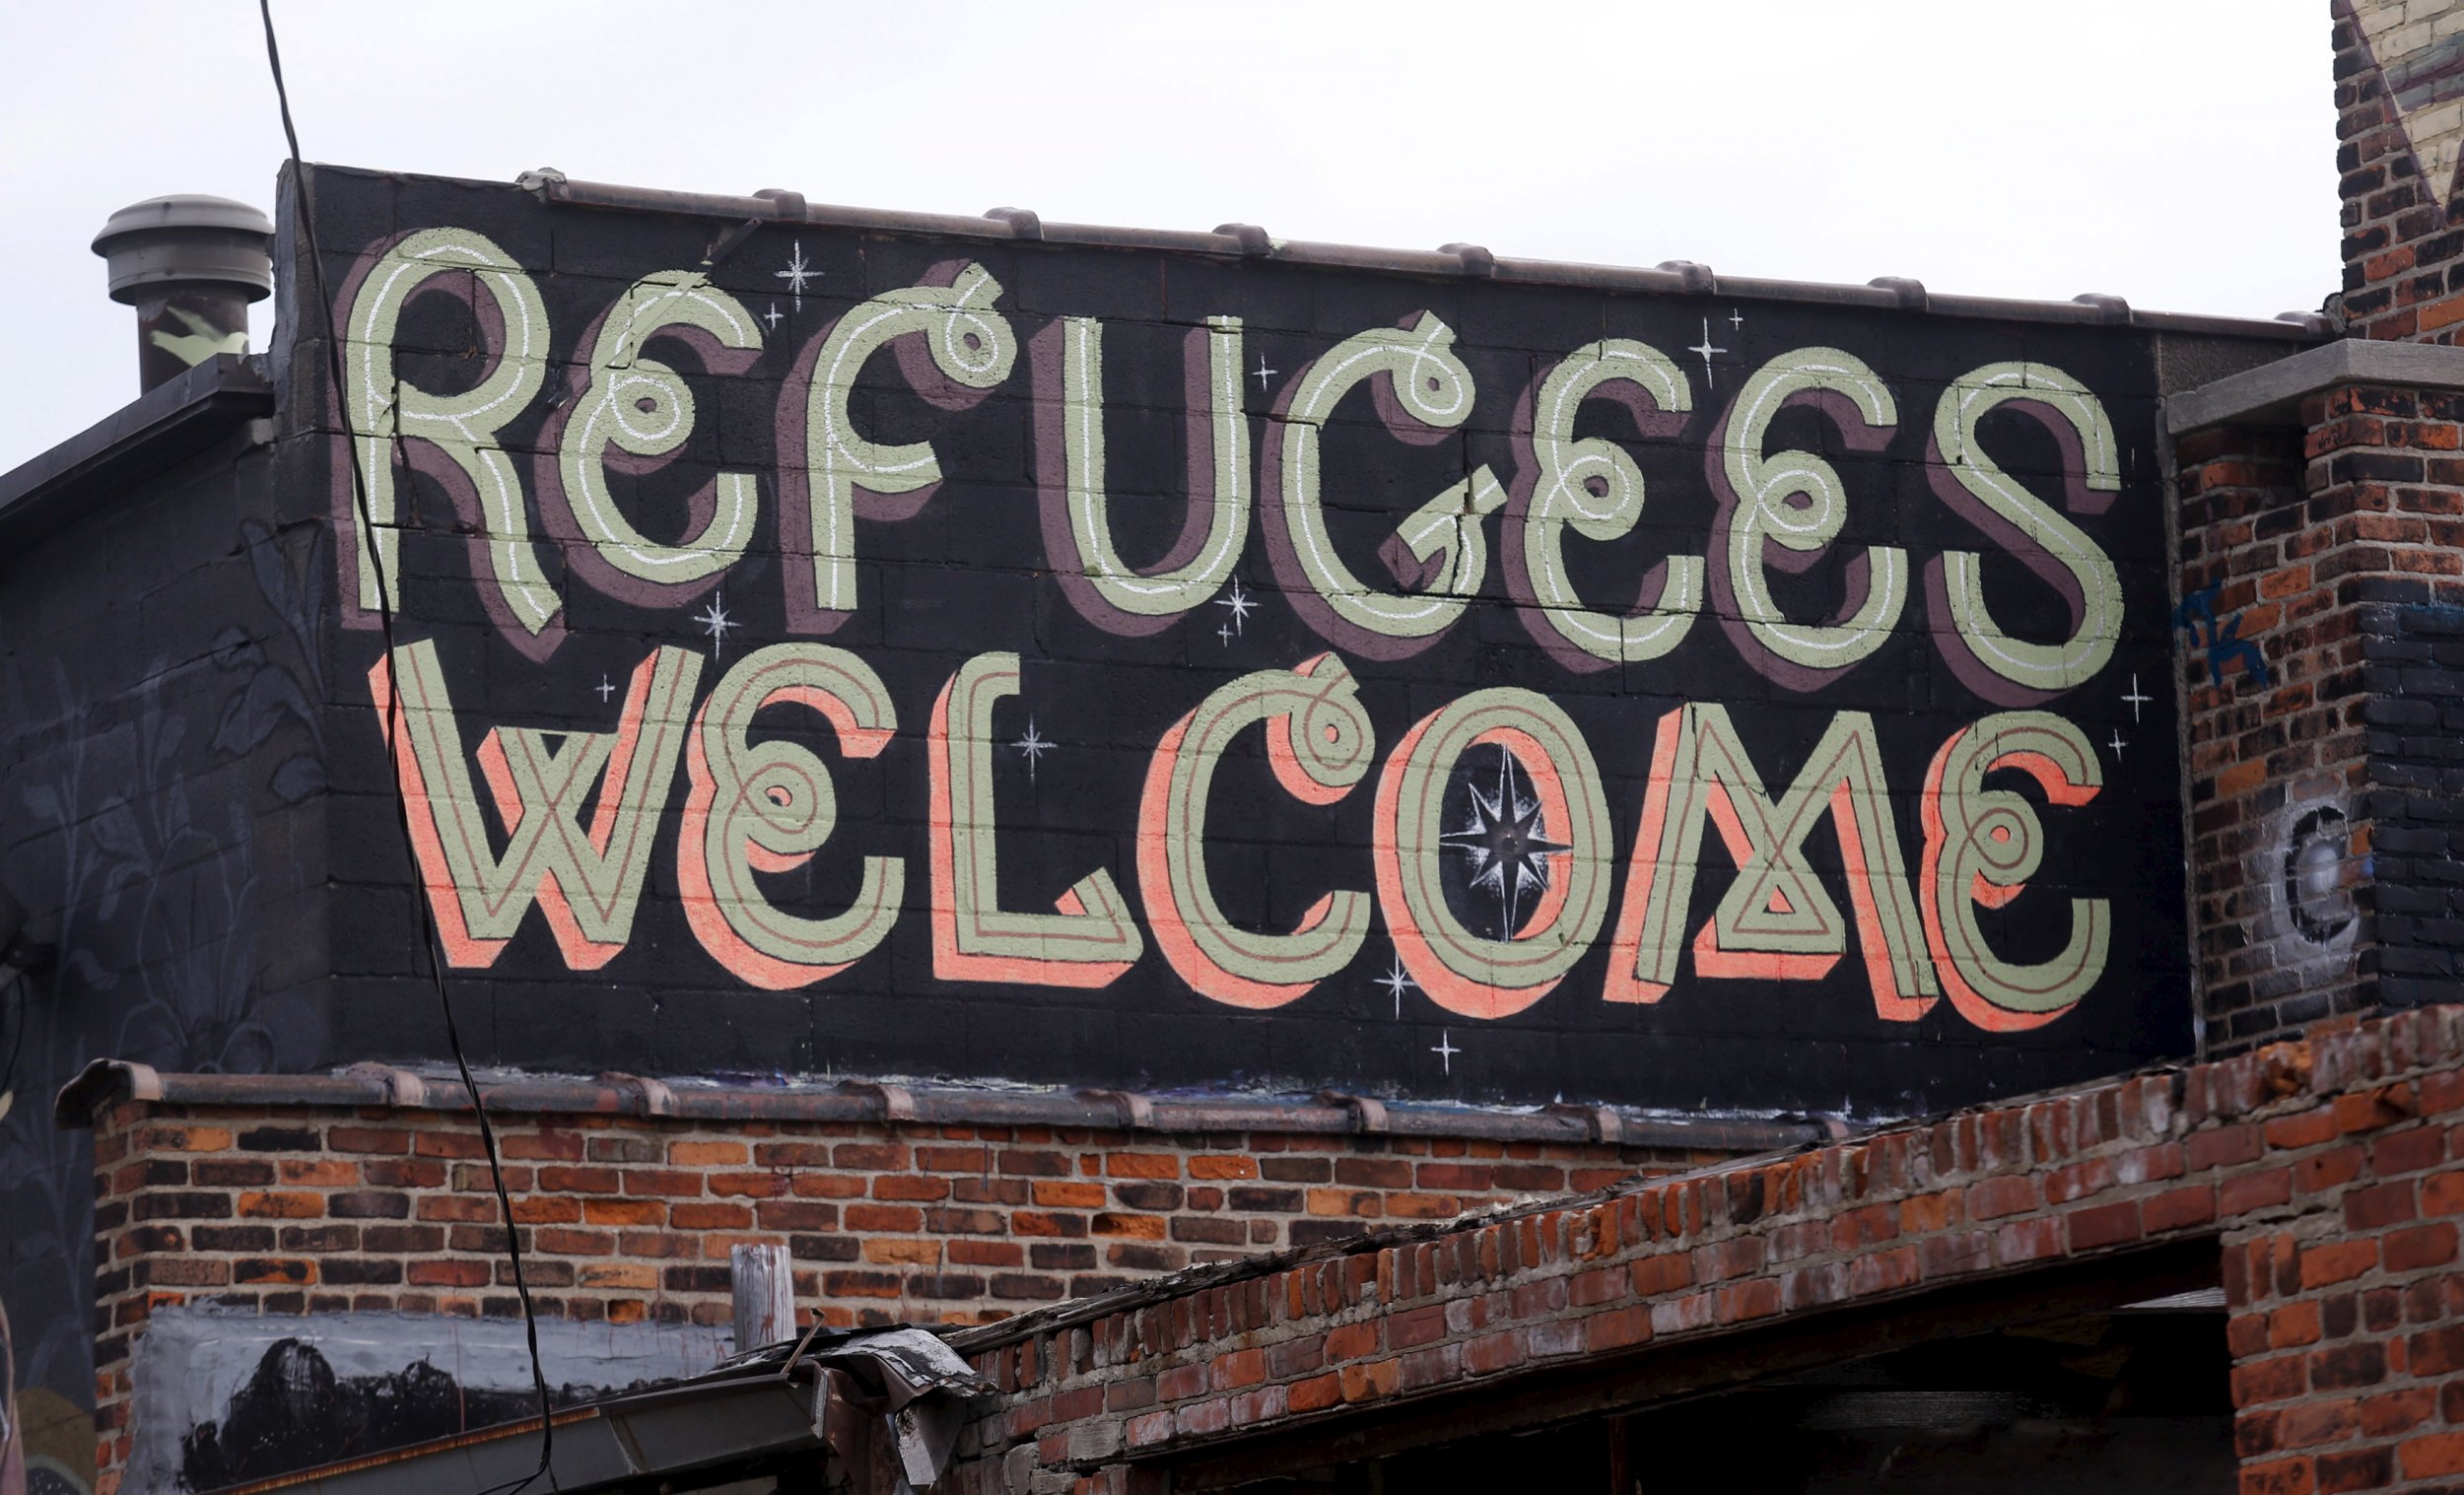 12_01_RefugeesWelcome_01